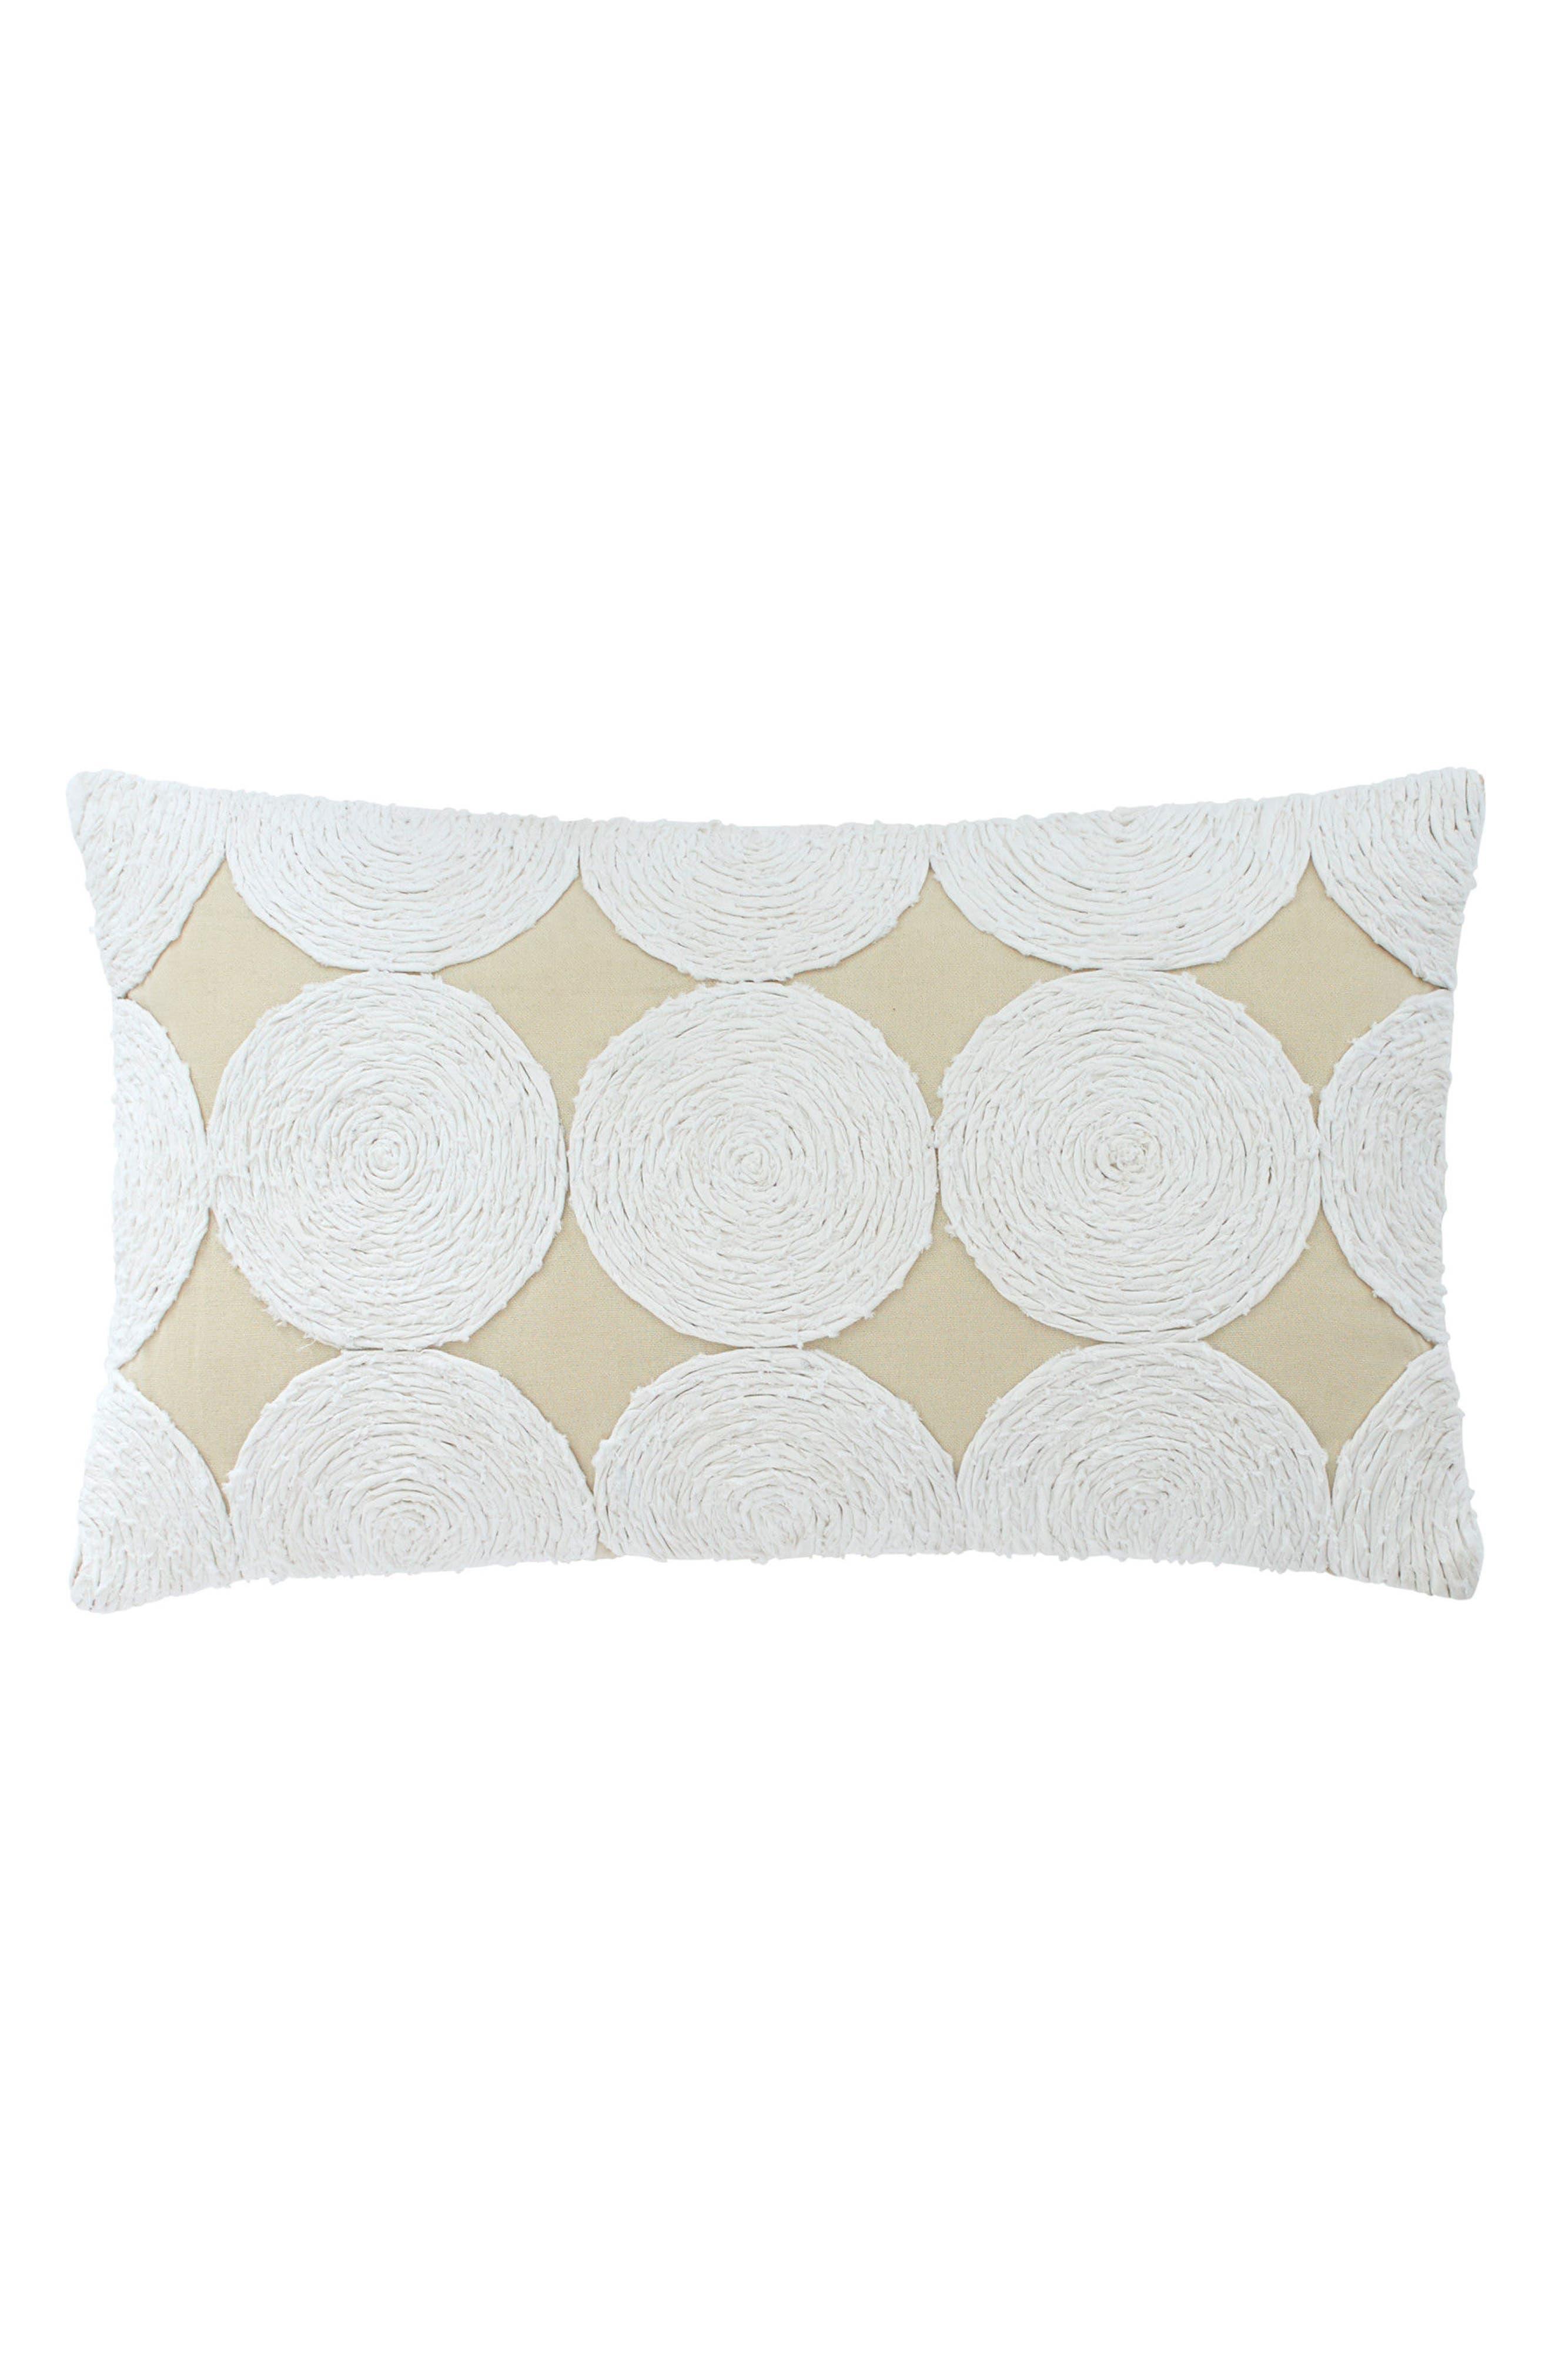 Southern Hospitality Appliqué Accent Pillow,                             Main thumbnail 1, color,                             250